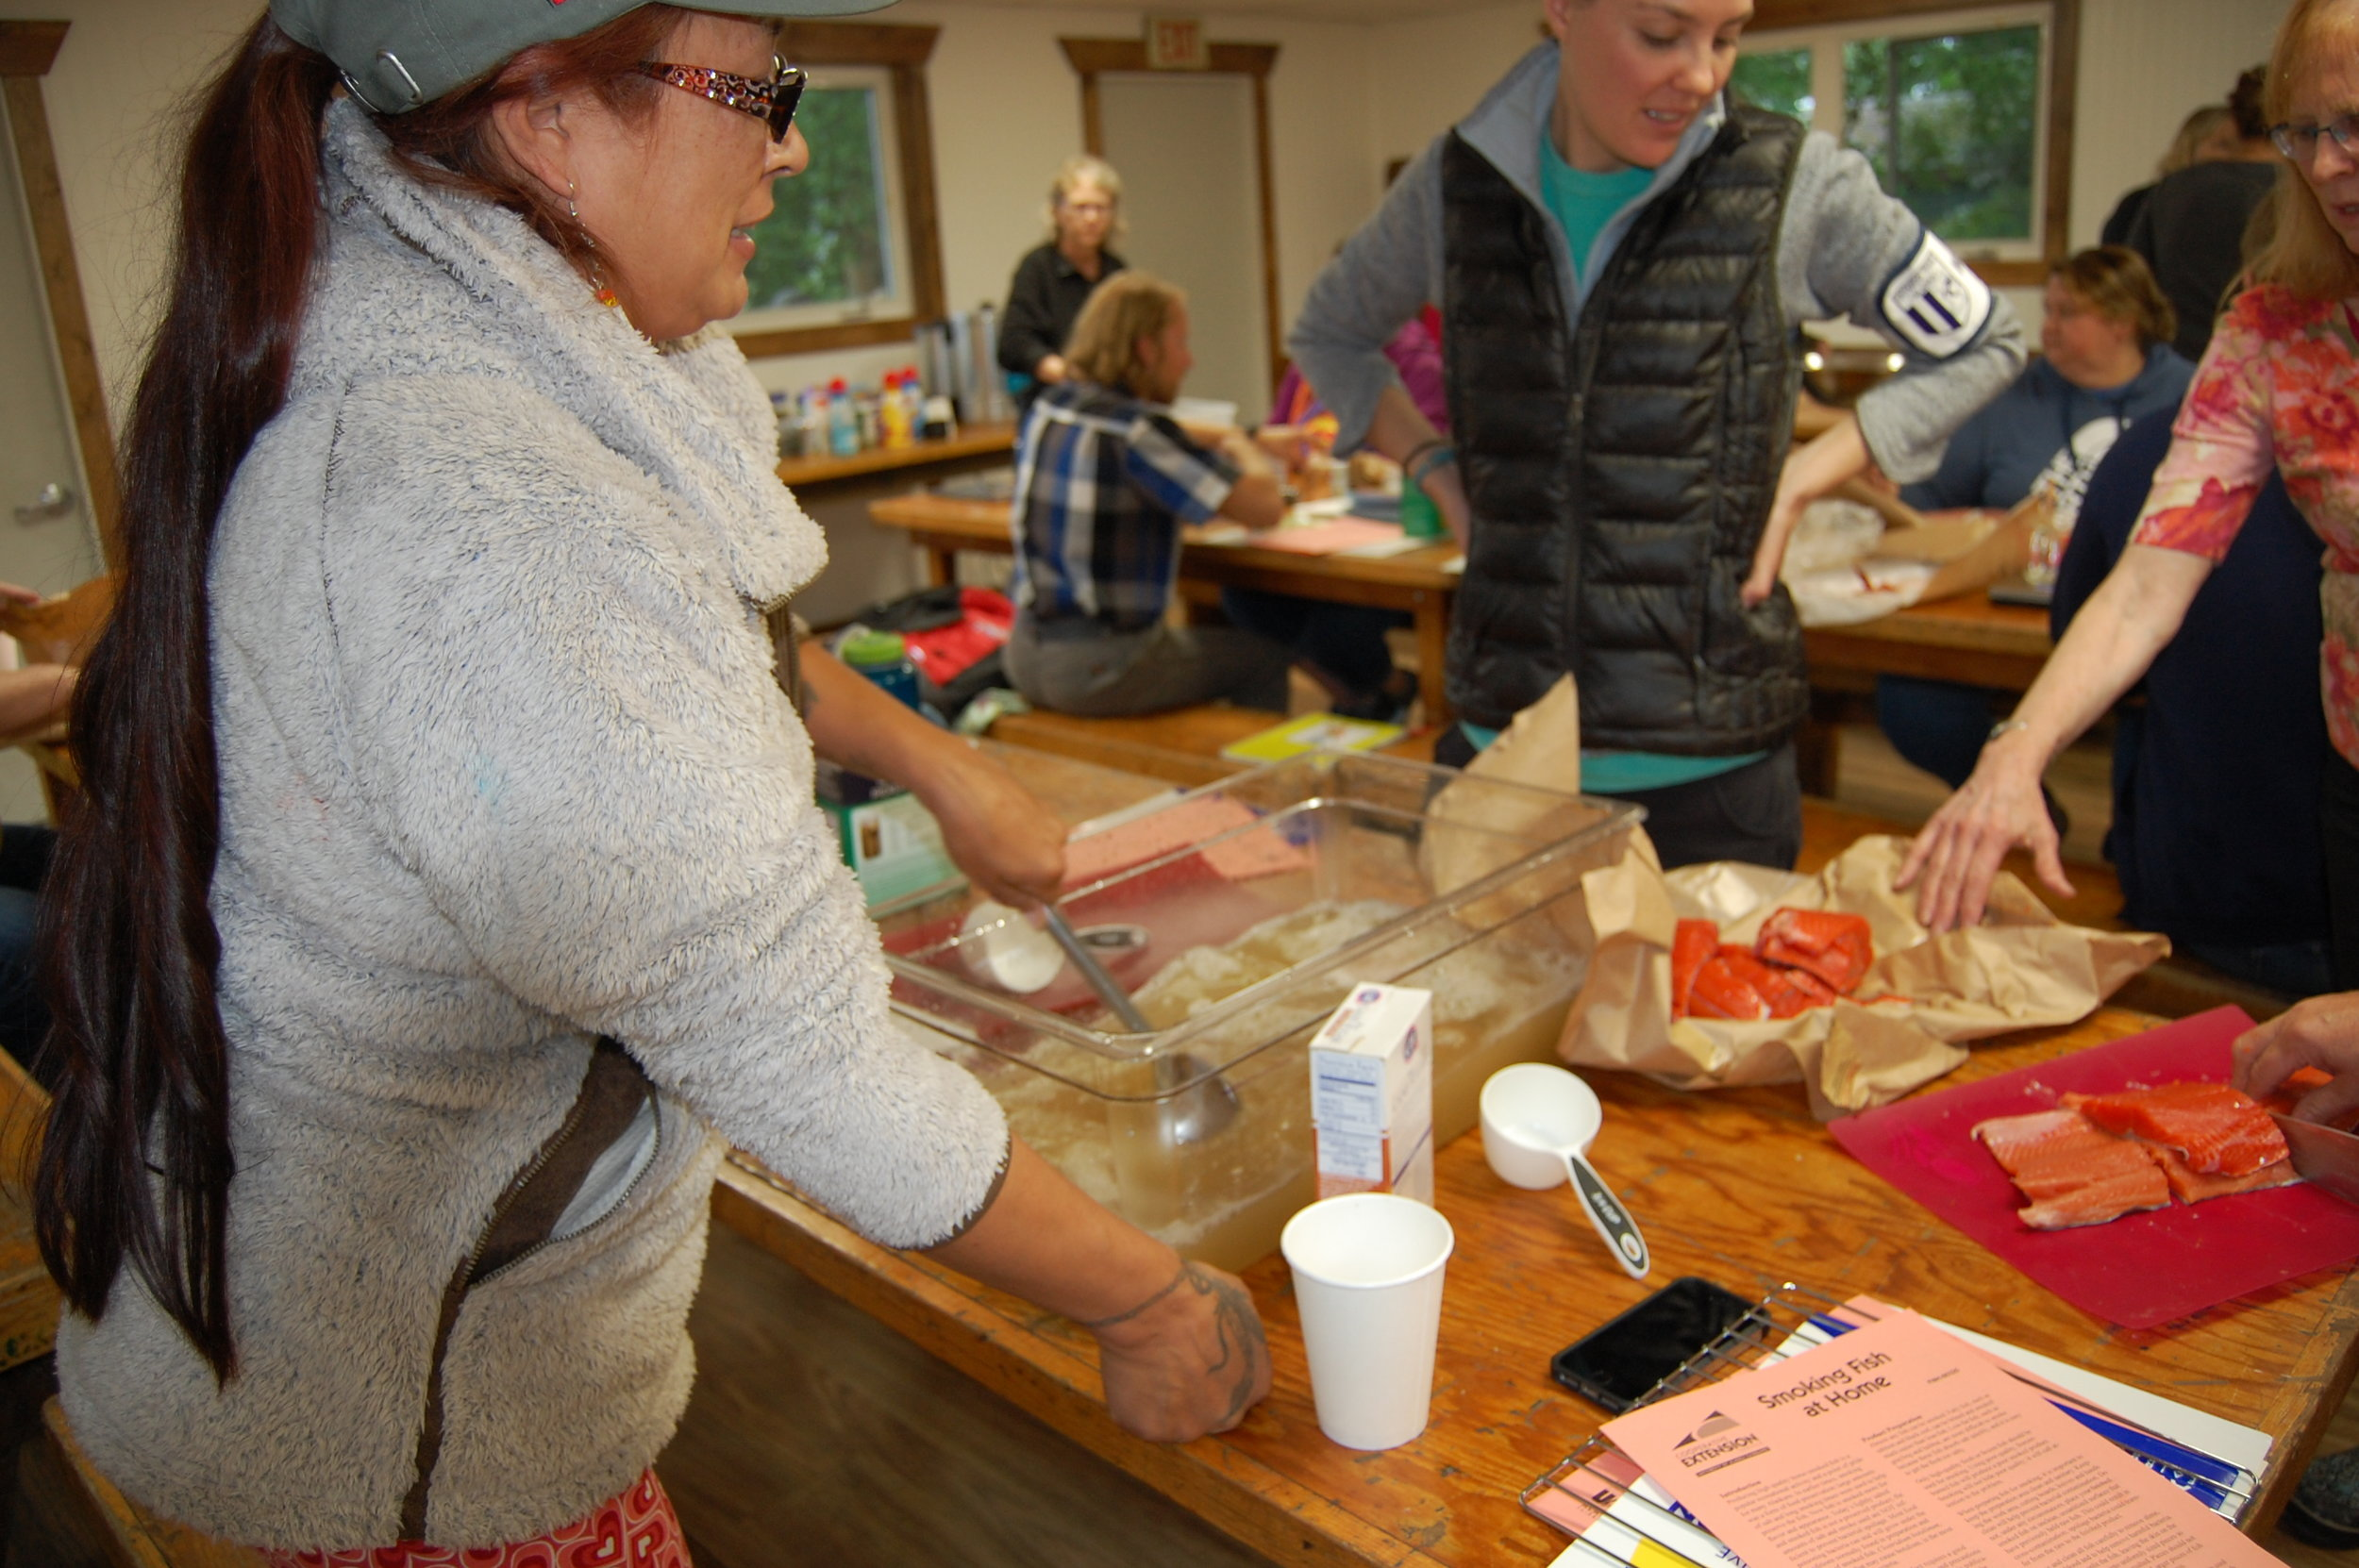 Preparing salmon for smoking